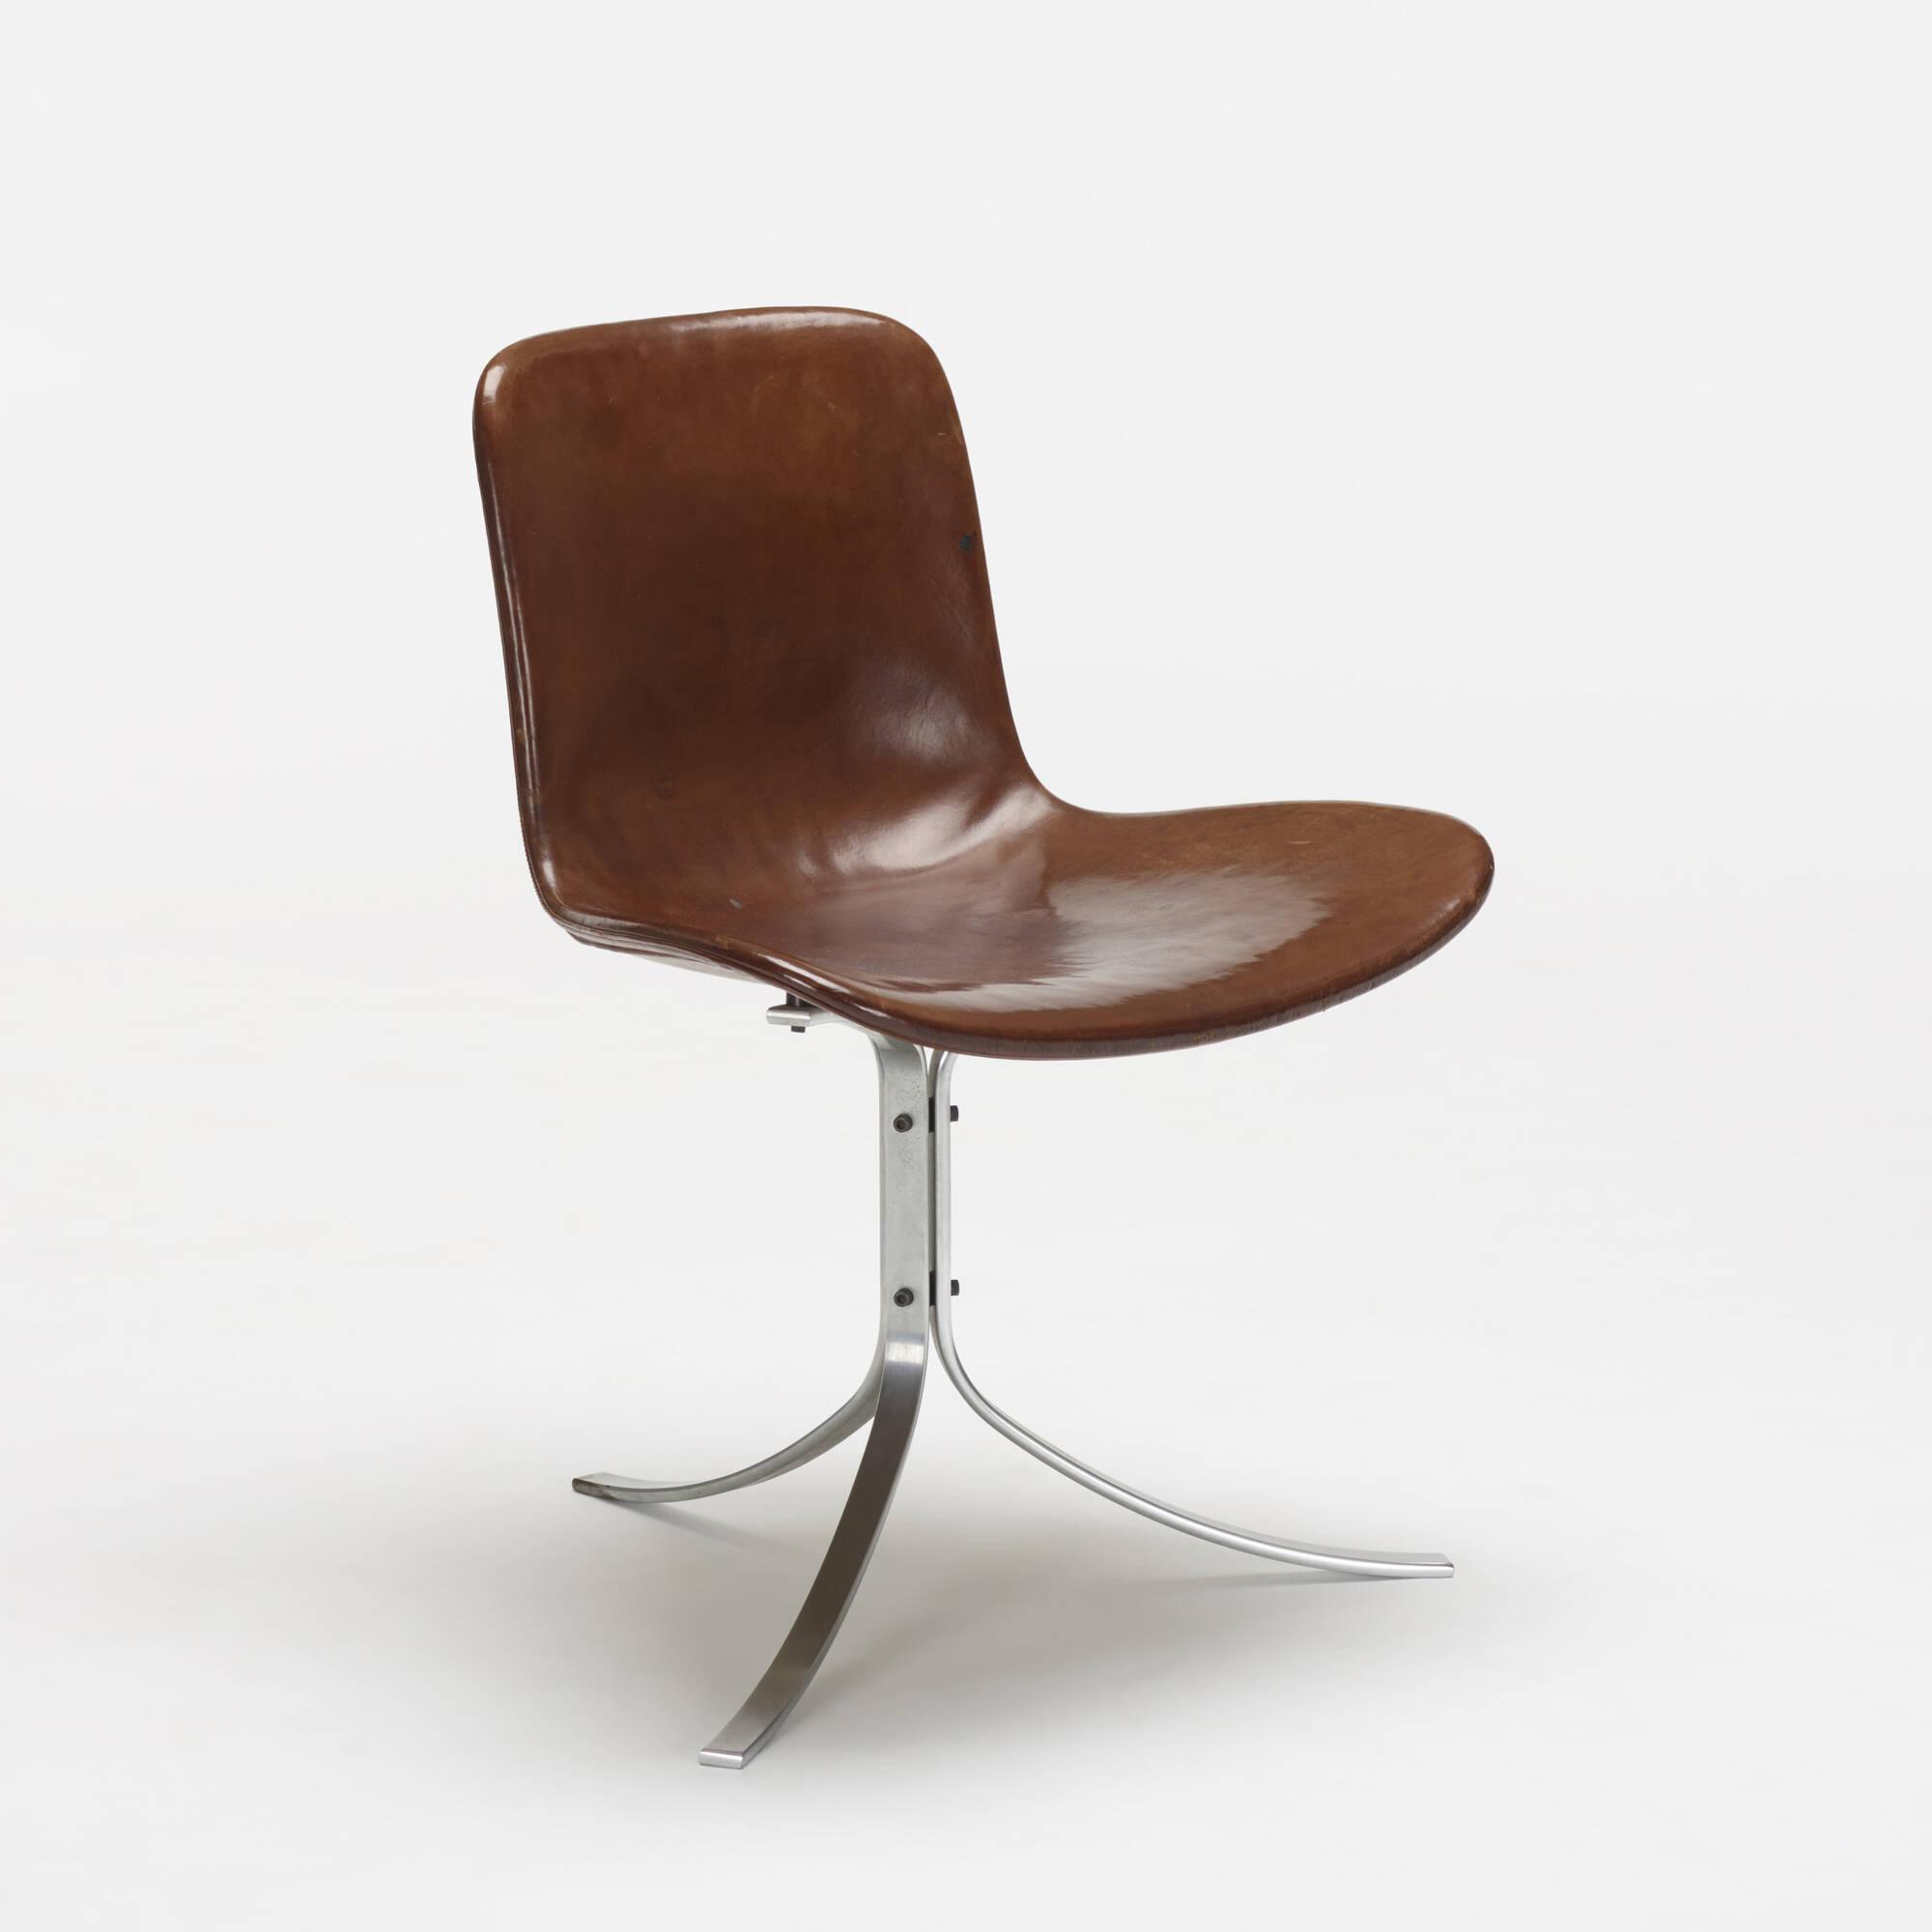 ... 252: Poul Kjaerholm / PK 9 Chairs, Set Of Six (3 Of 4